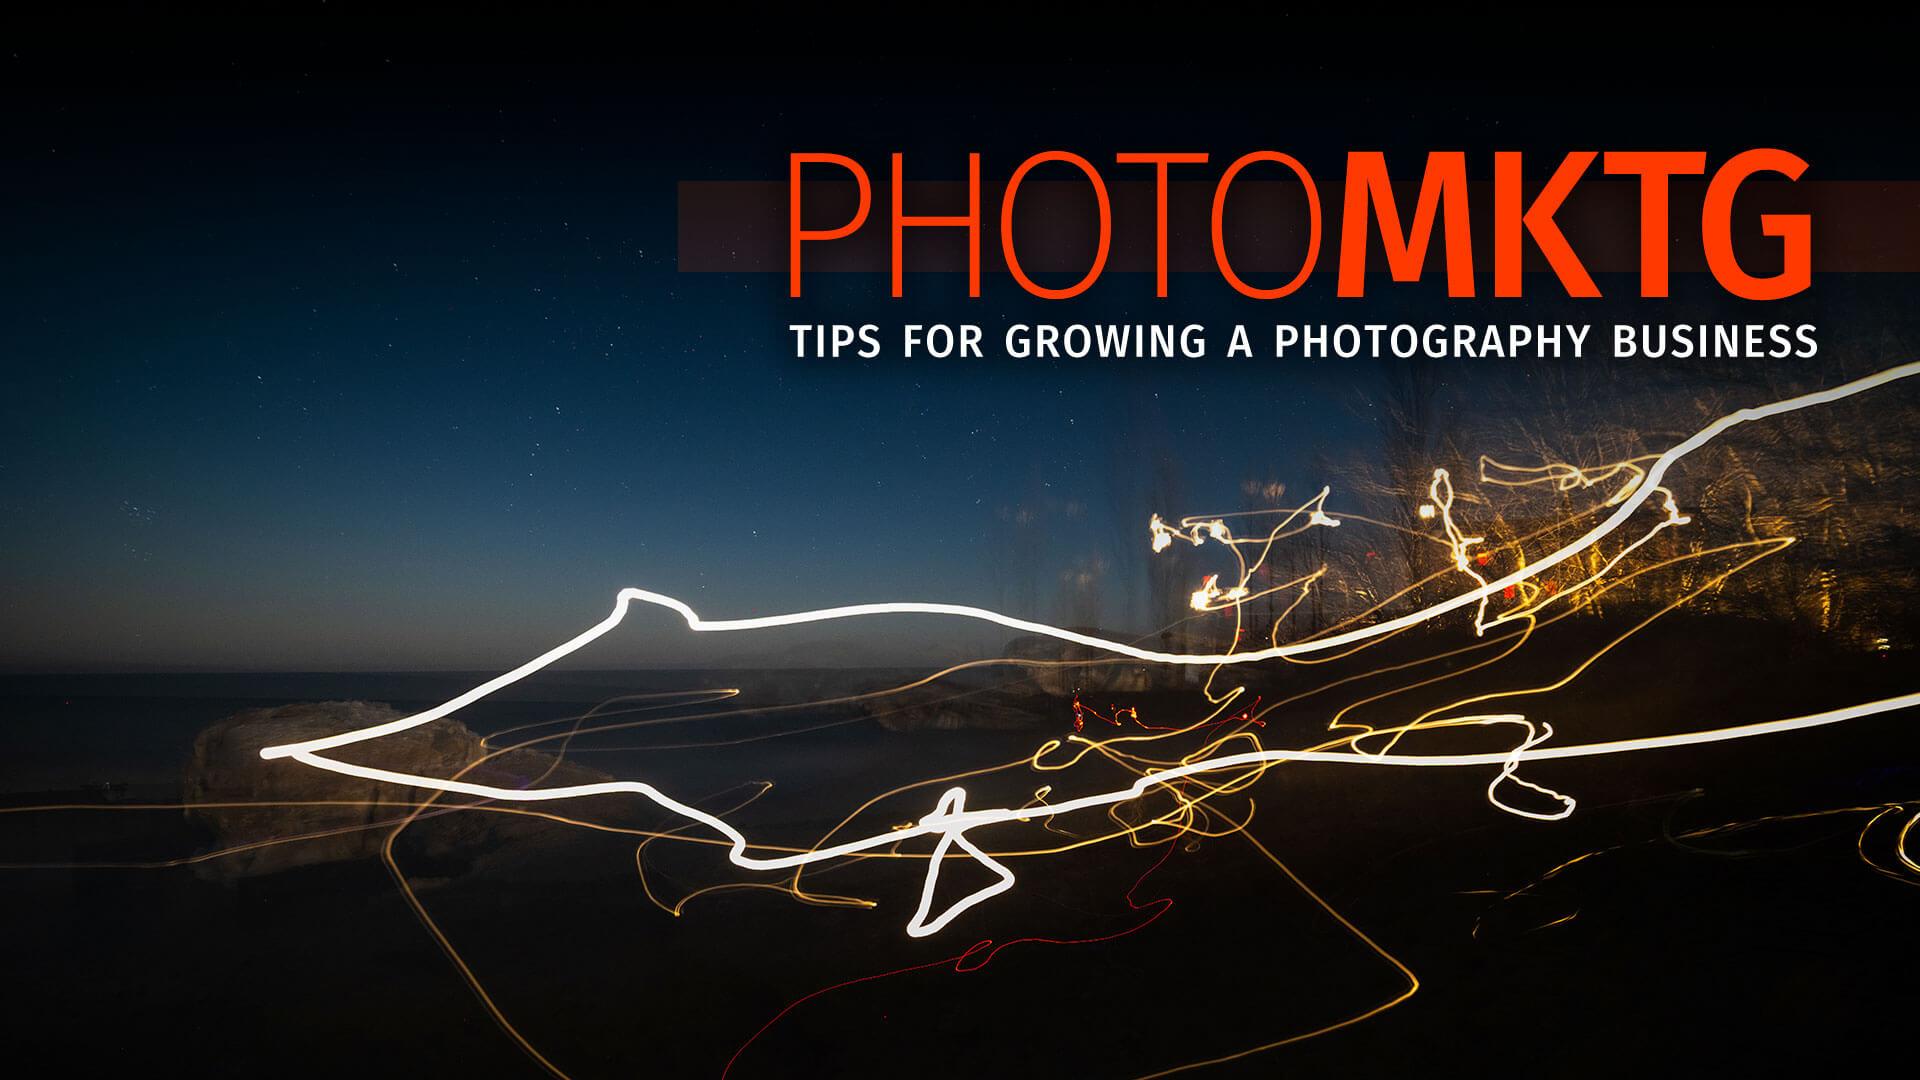 photomktg-041519